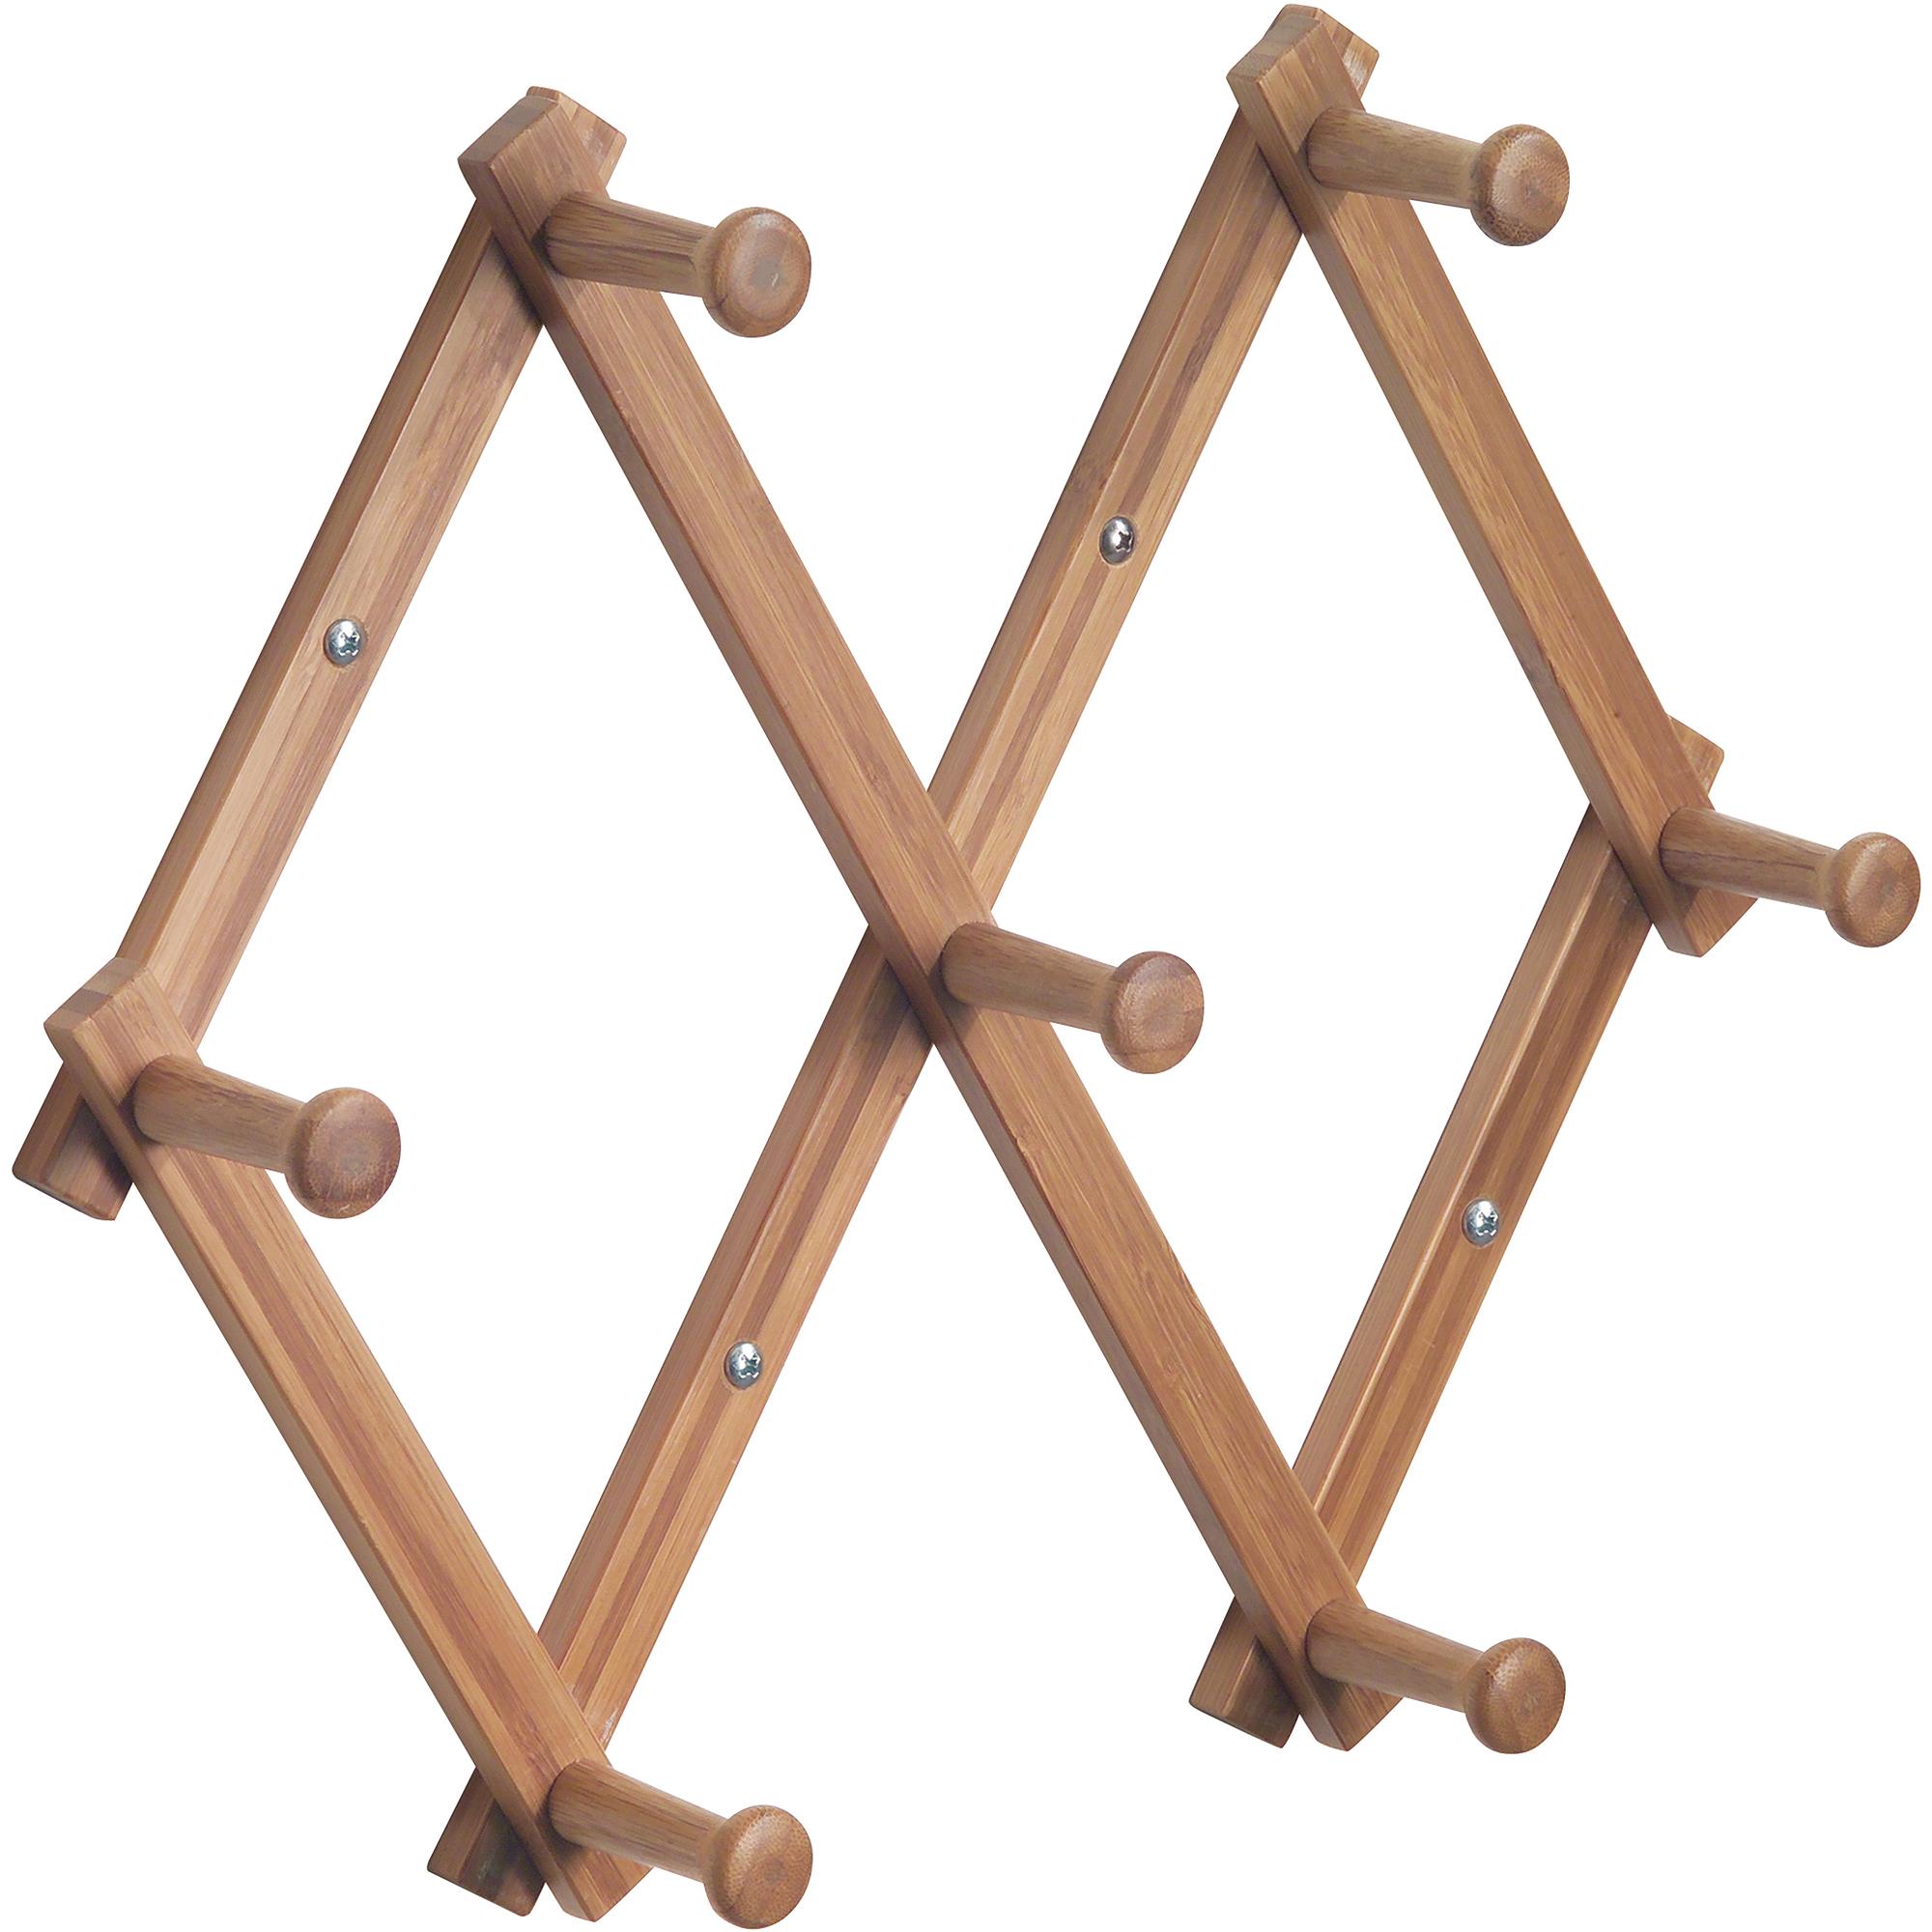 Mainstays Wood Expandable Rack, Bamboo